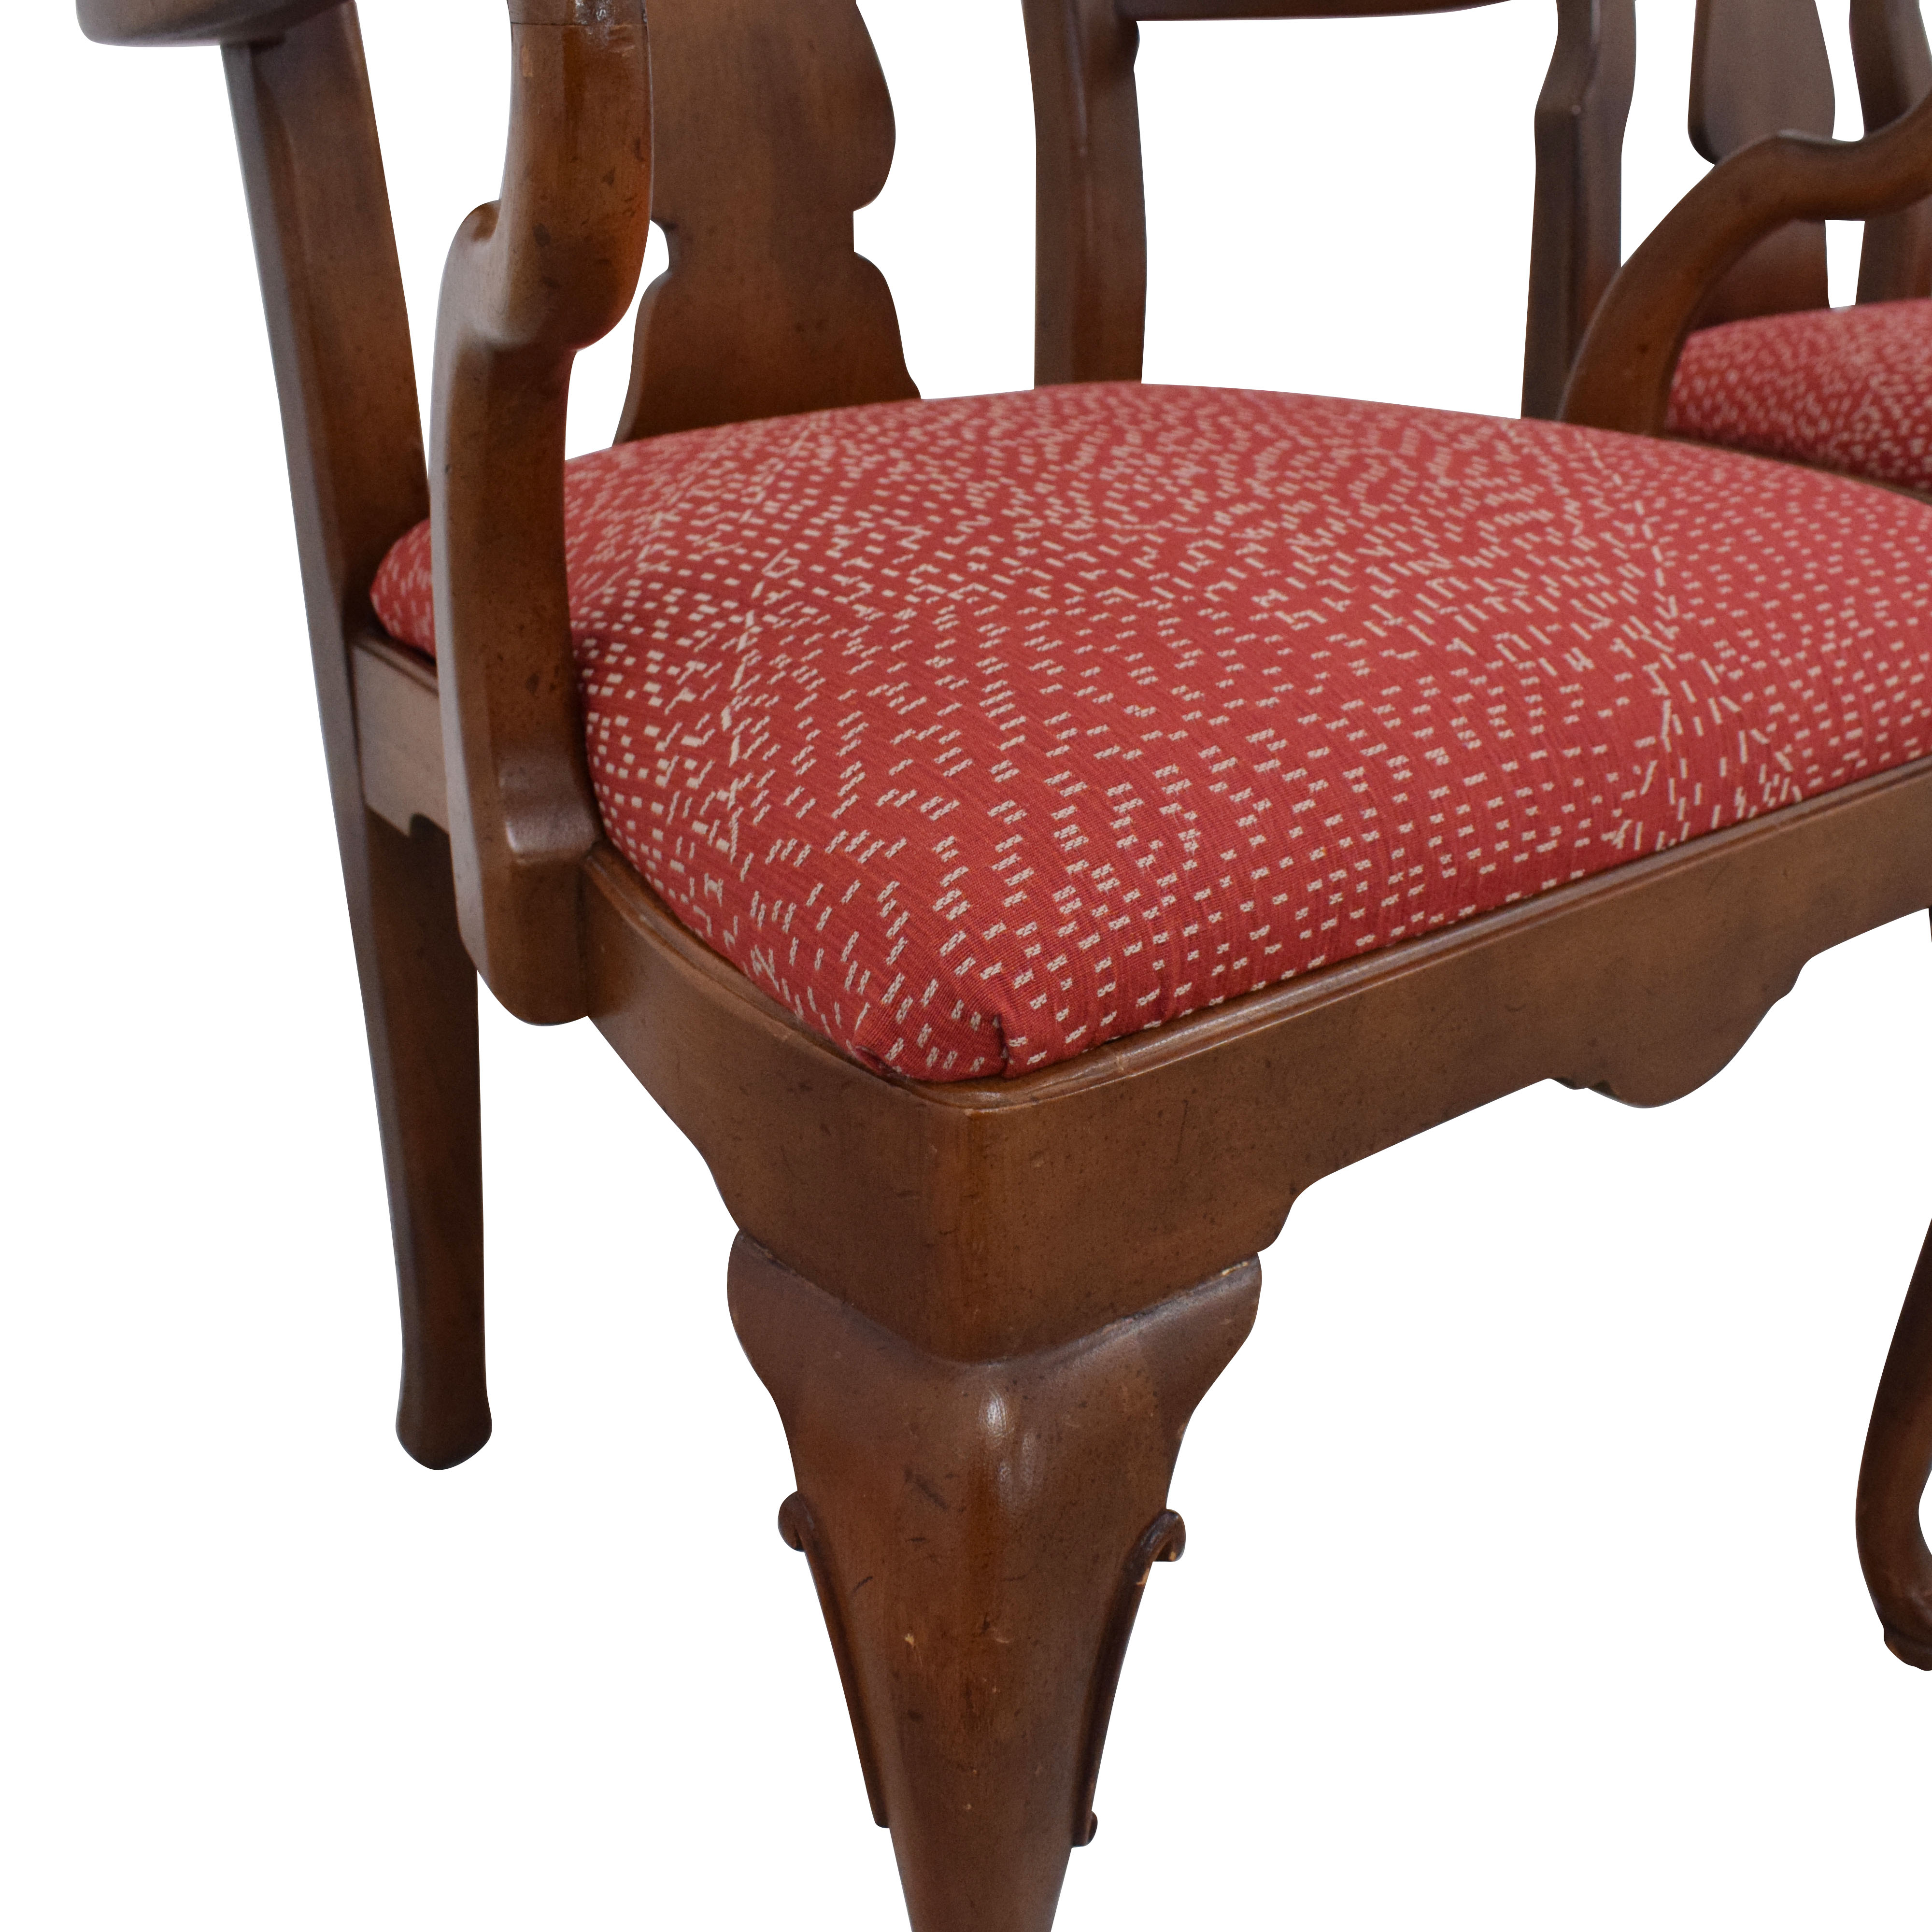 Henredon Furniture Henredon Queen Anne Chairs red & brown